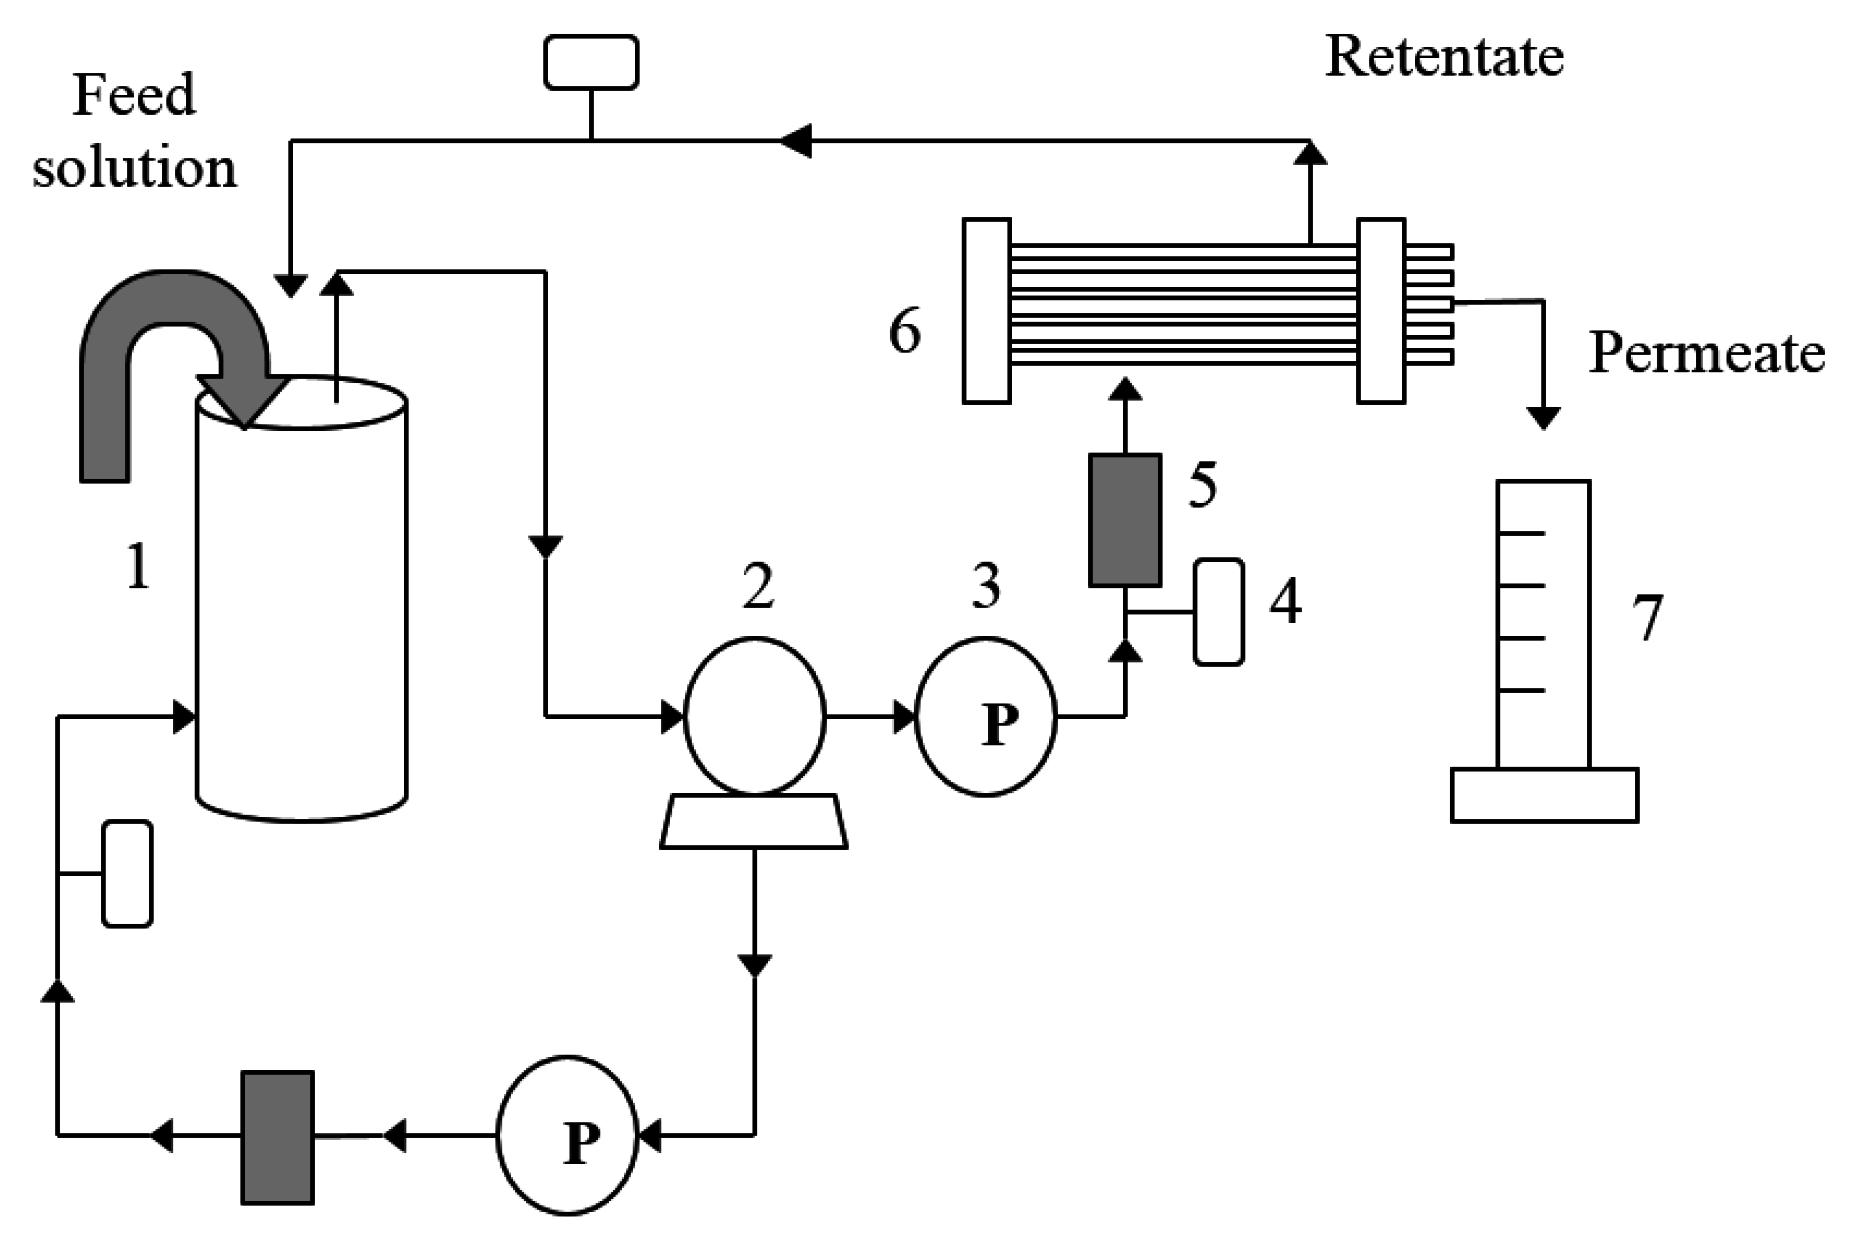 wastewater treatment flow diagram